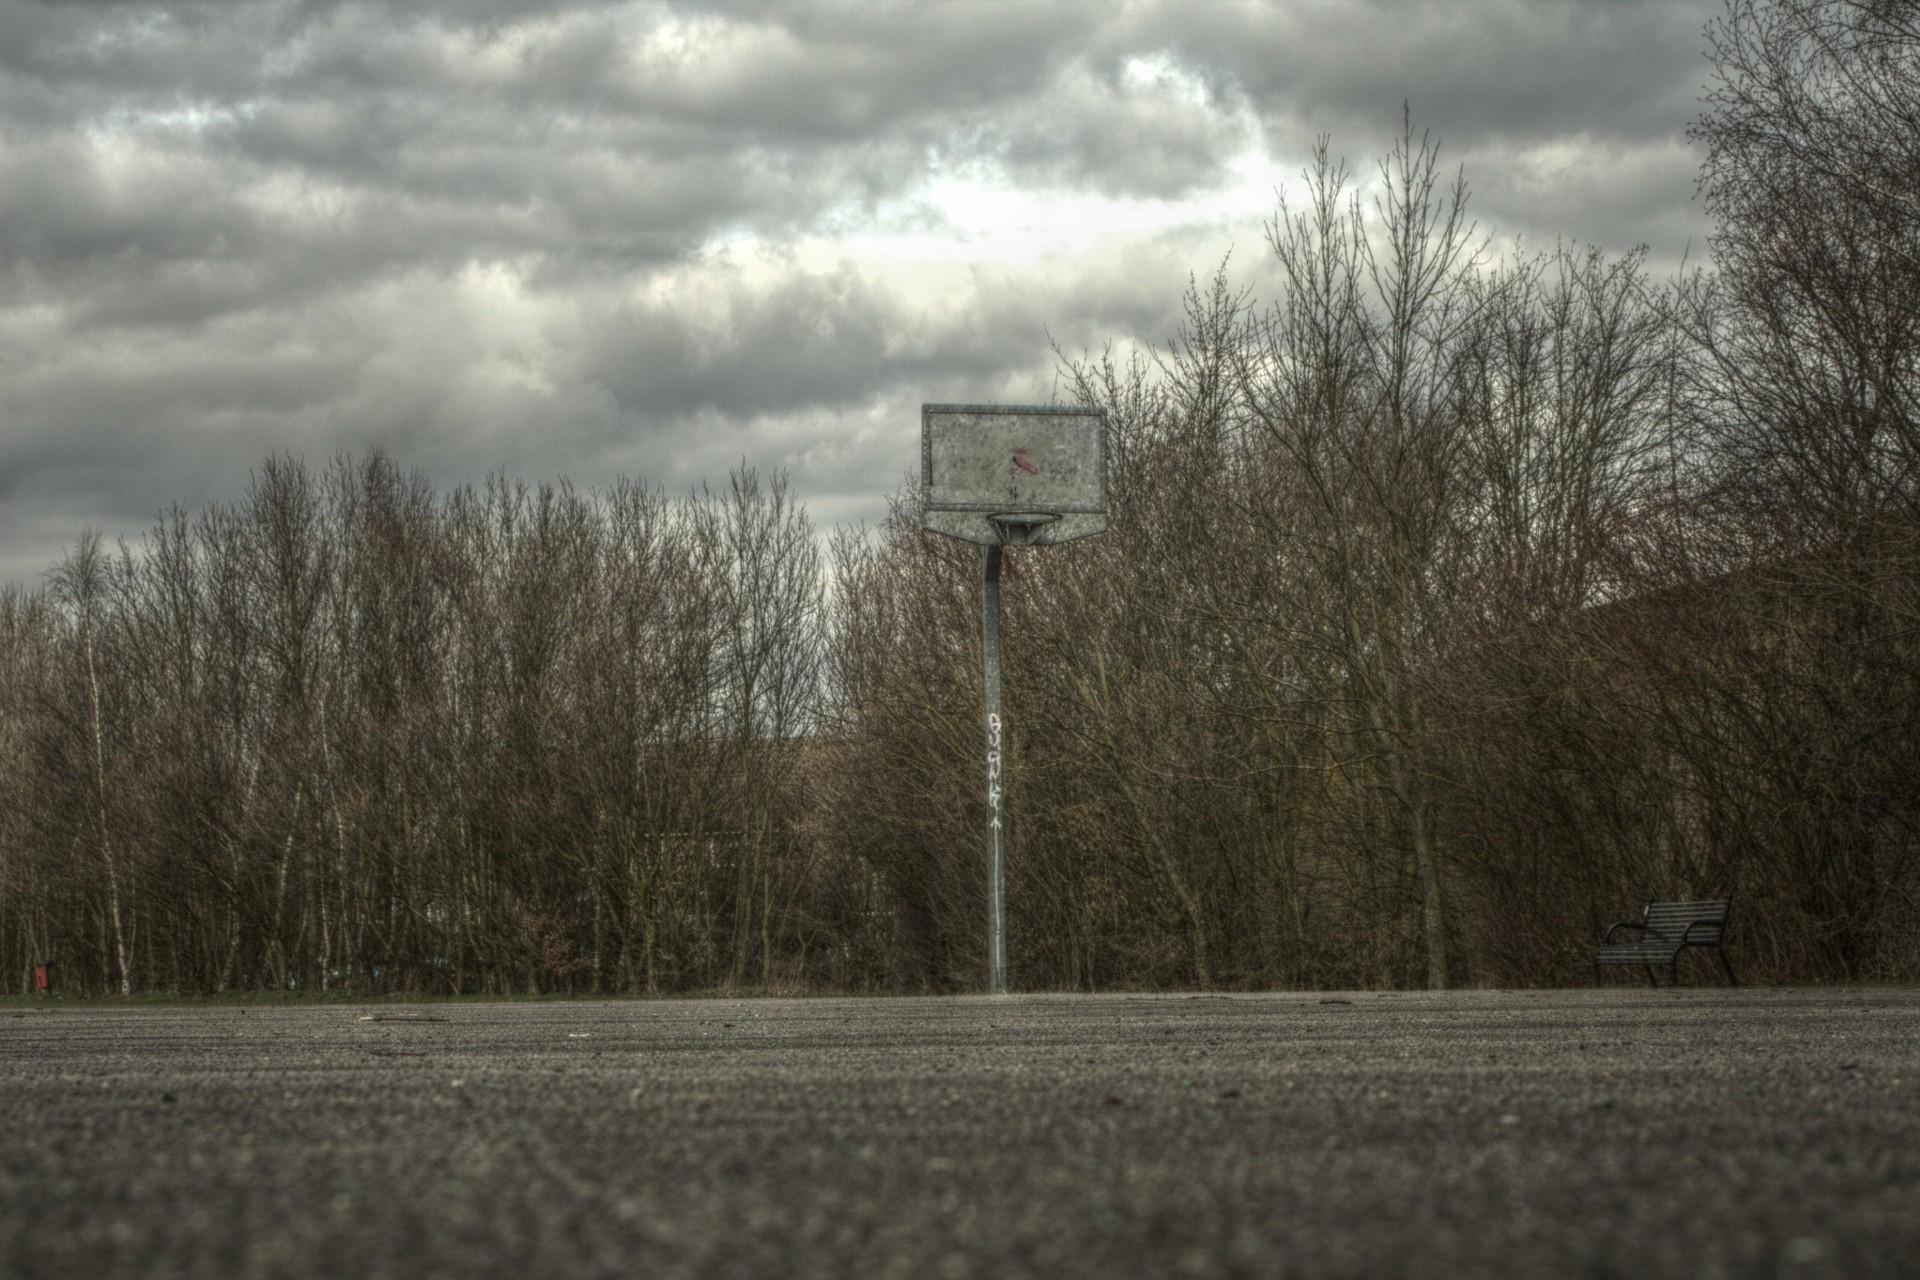 Basketball court background download free high - Court wallpaper ...